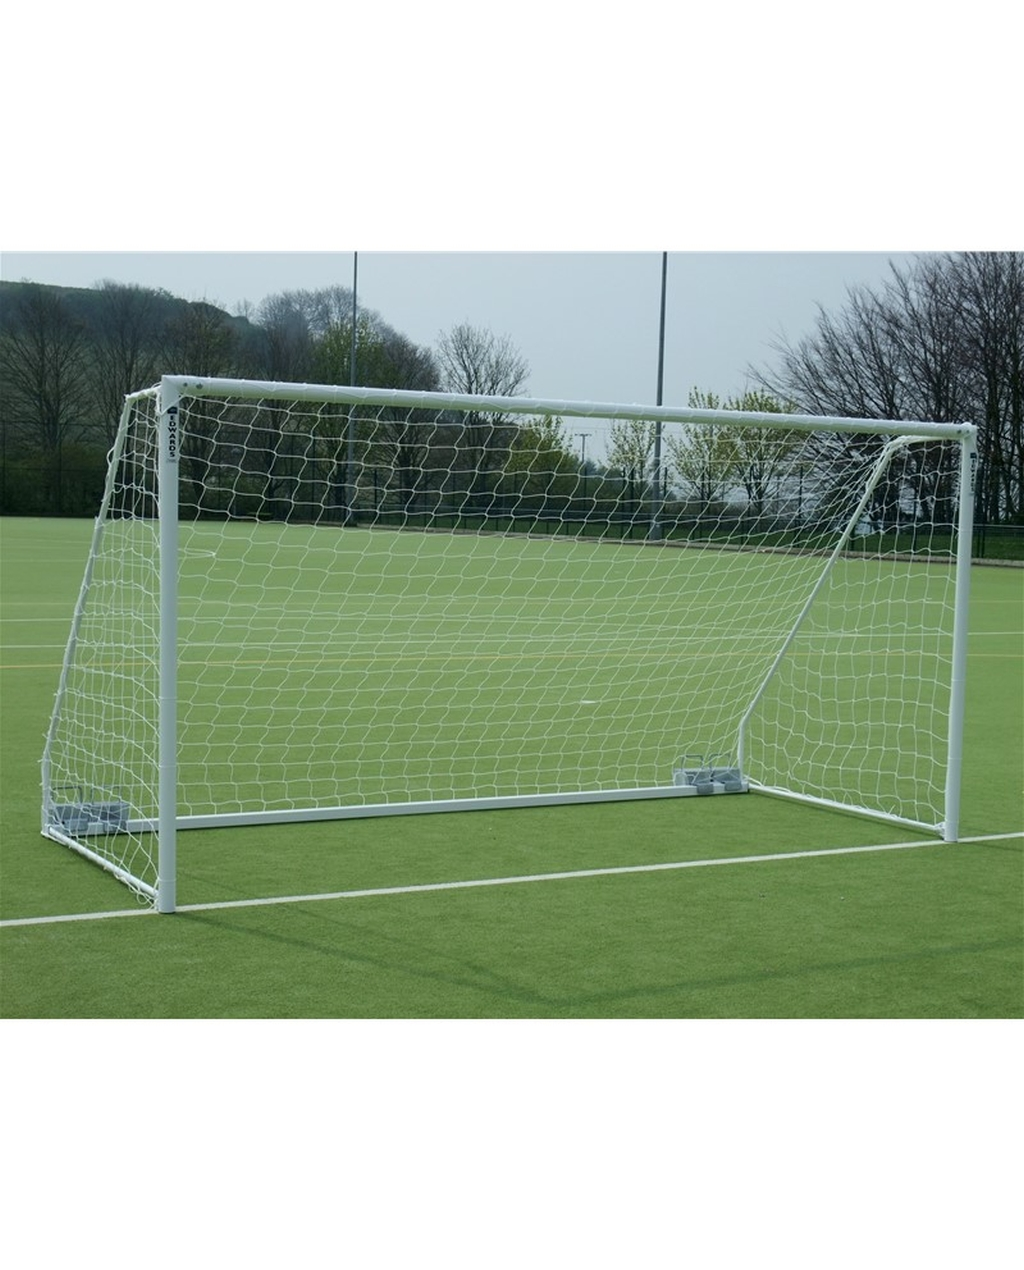 Nets for Mini Football Goals